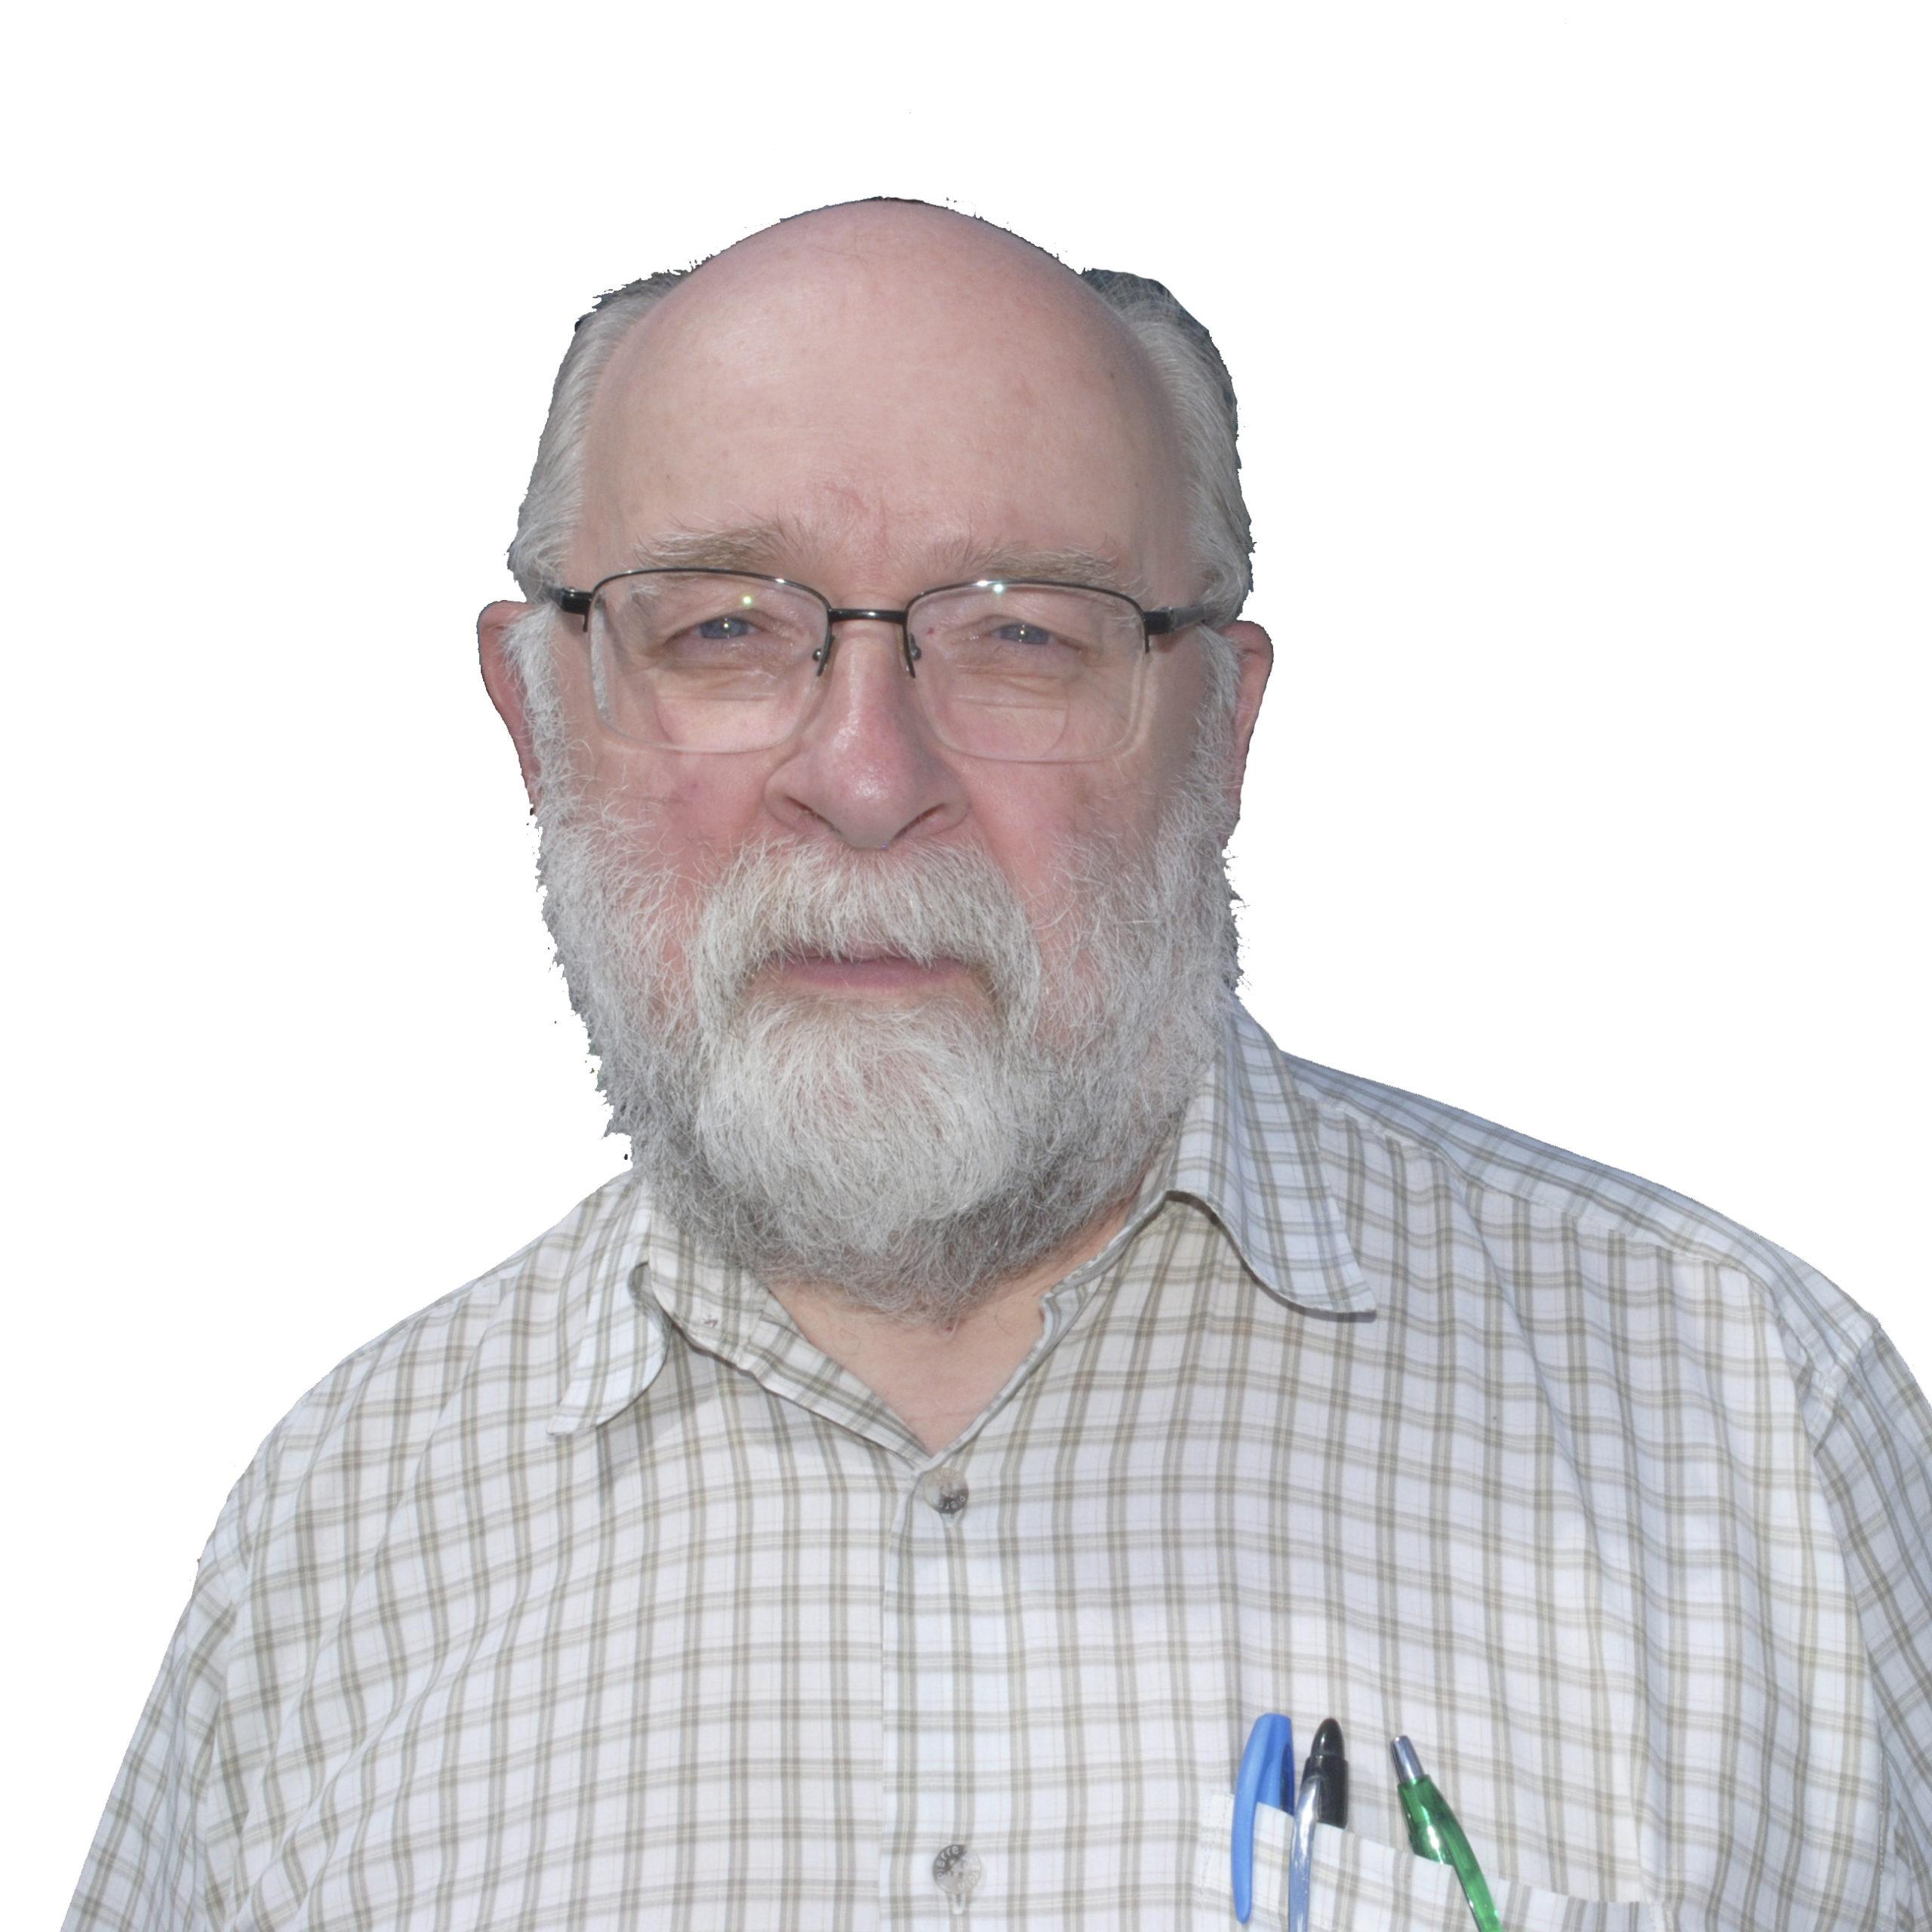 John Fryters